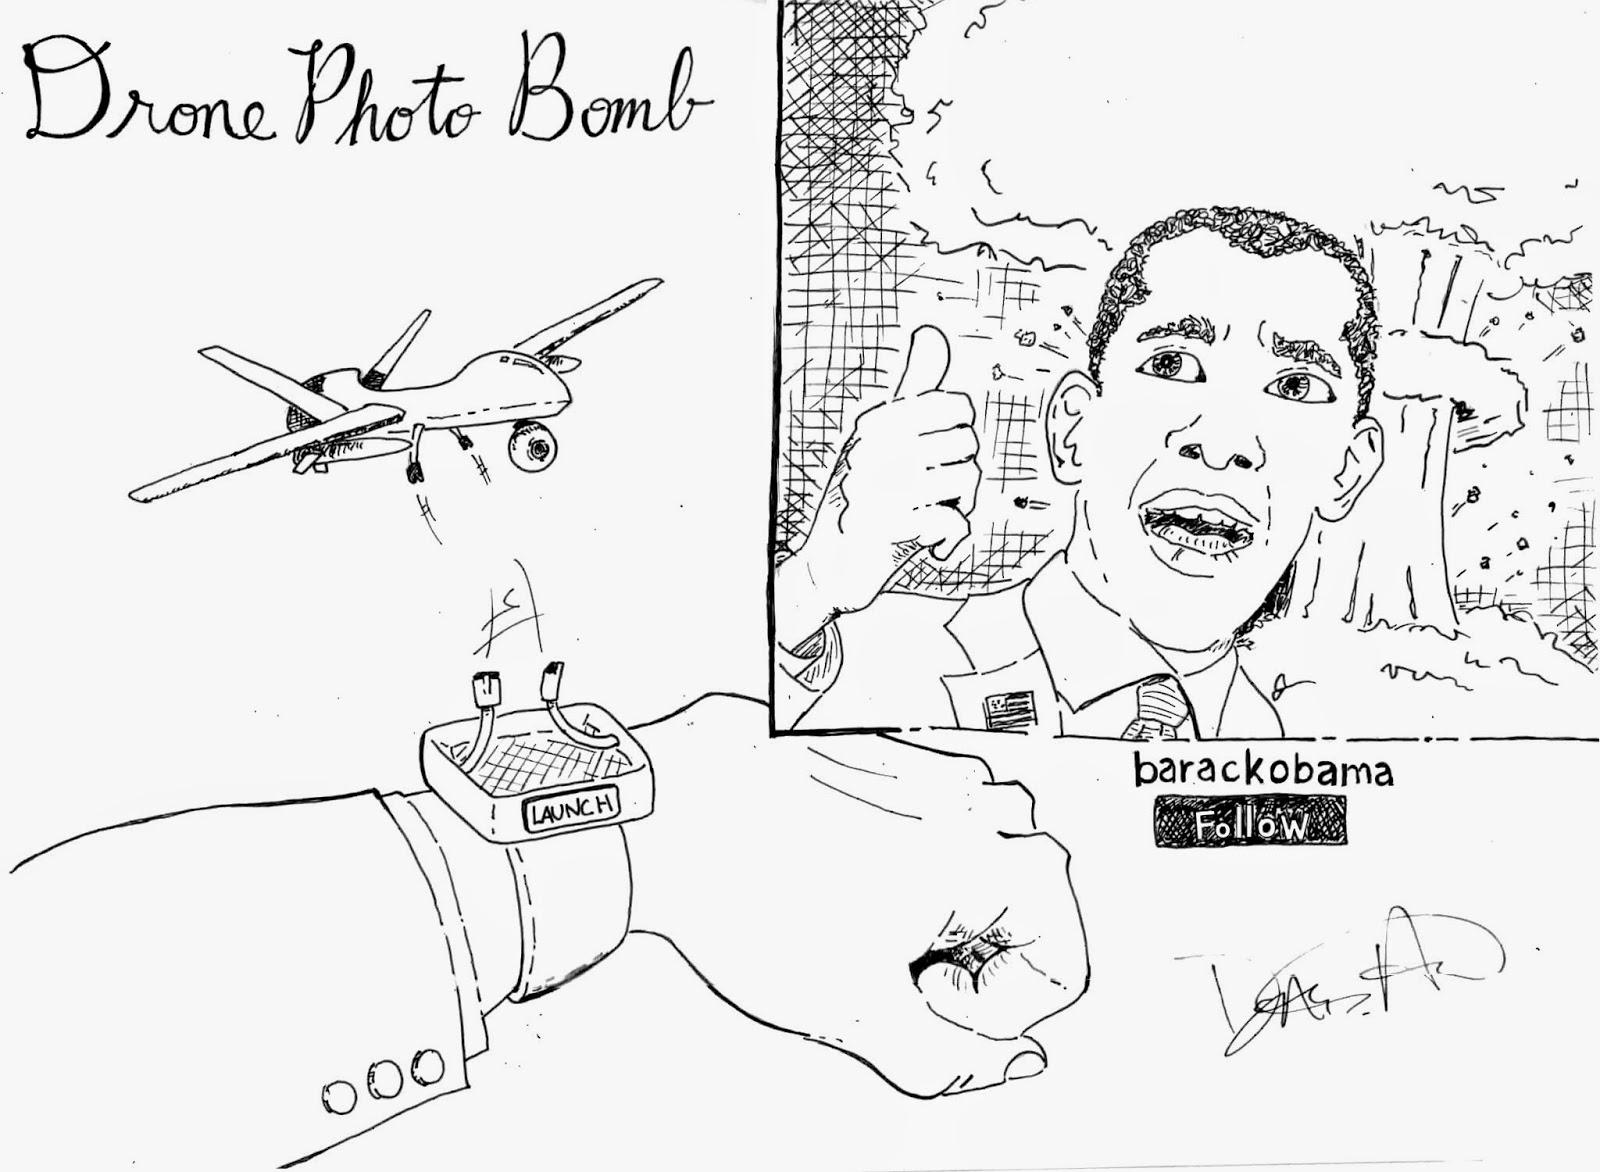 drone%2Bphoto%2Bbomb%2B2.jpg